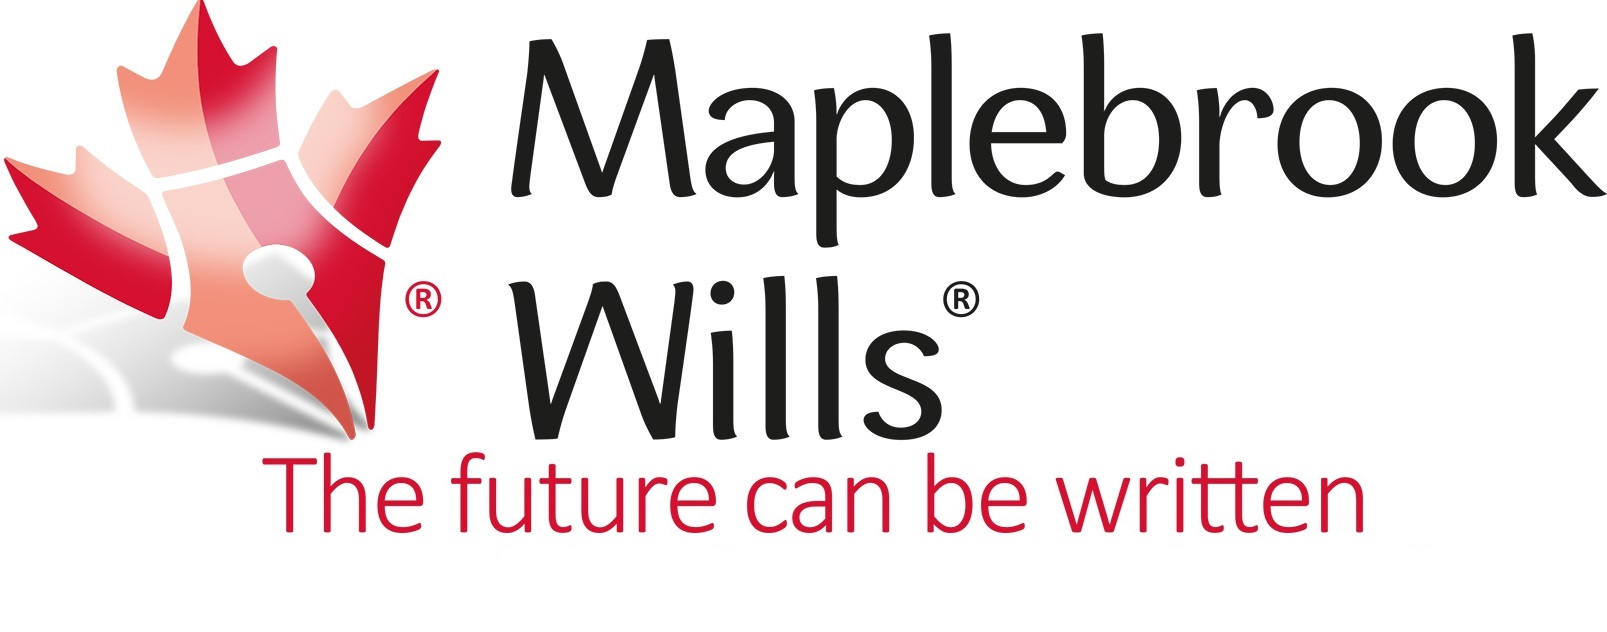 Maplebrook Wills